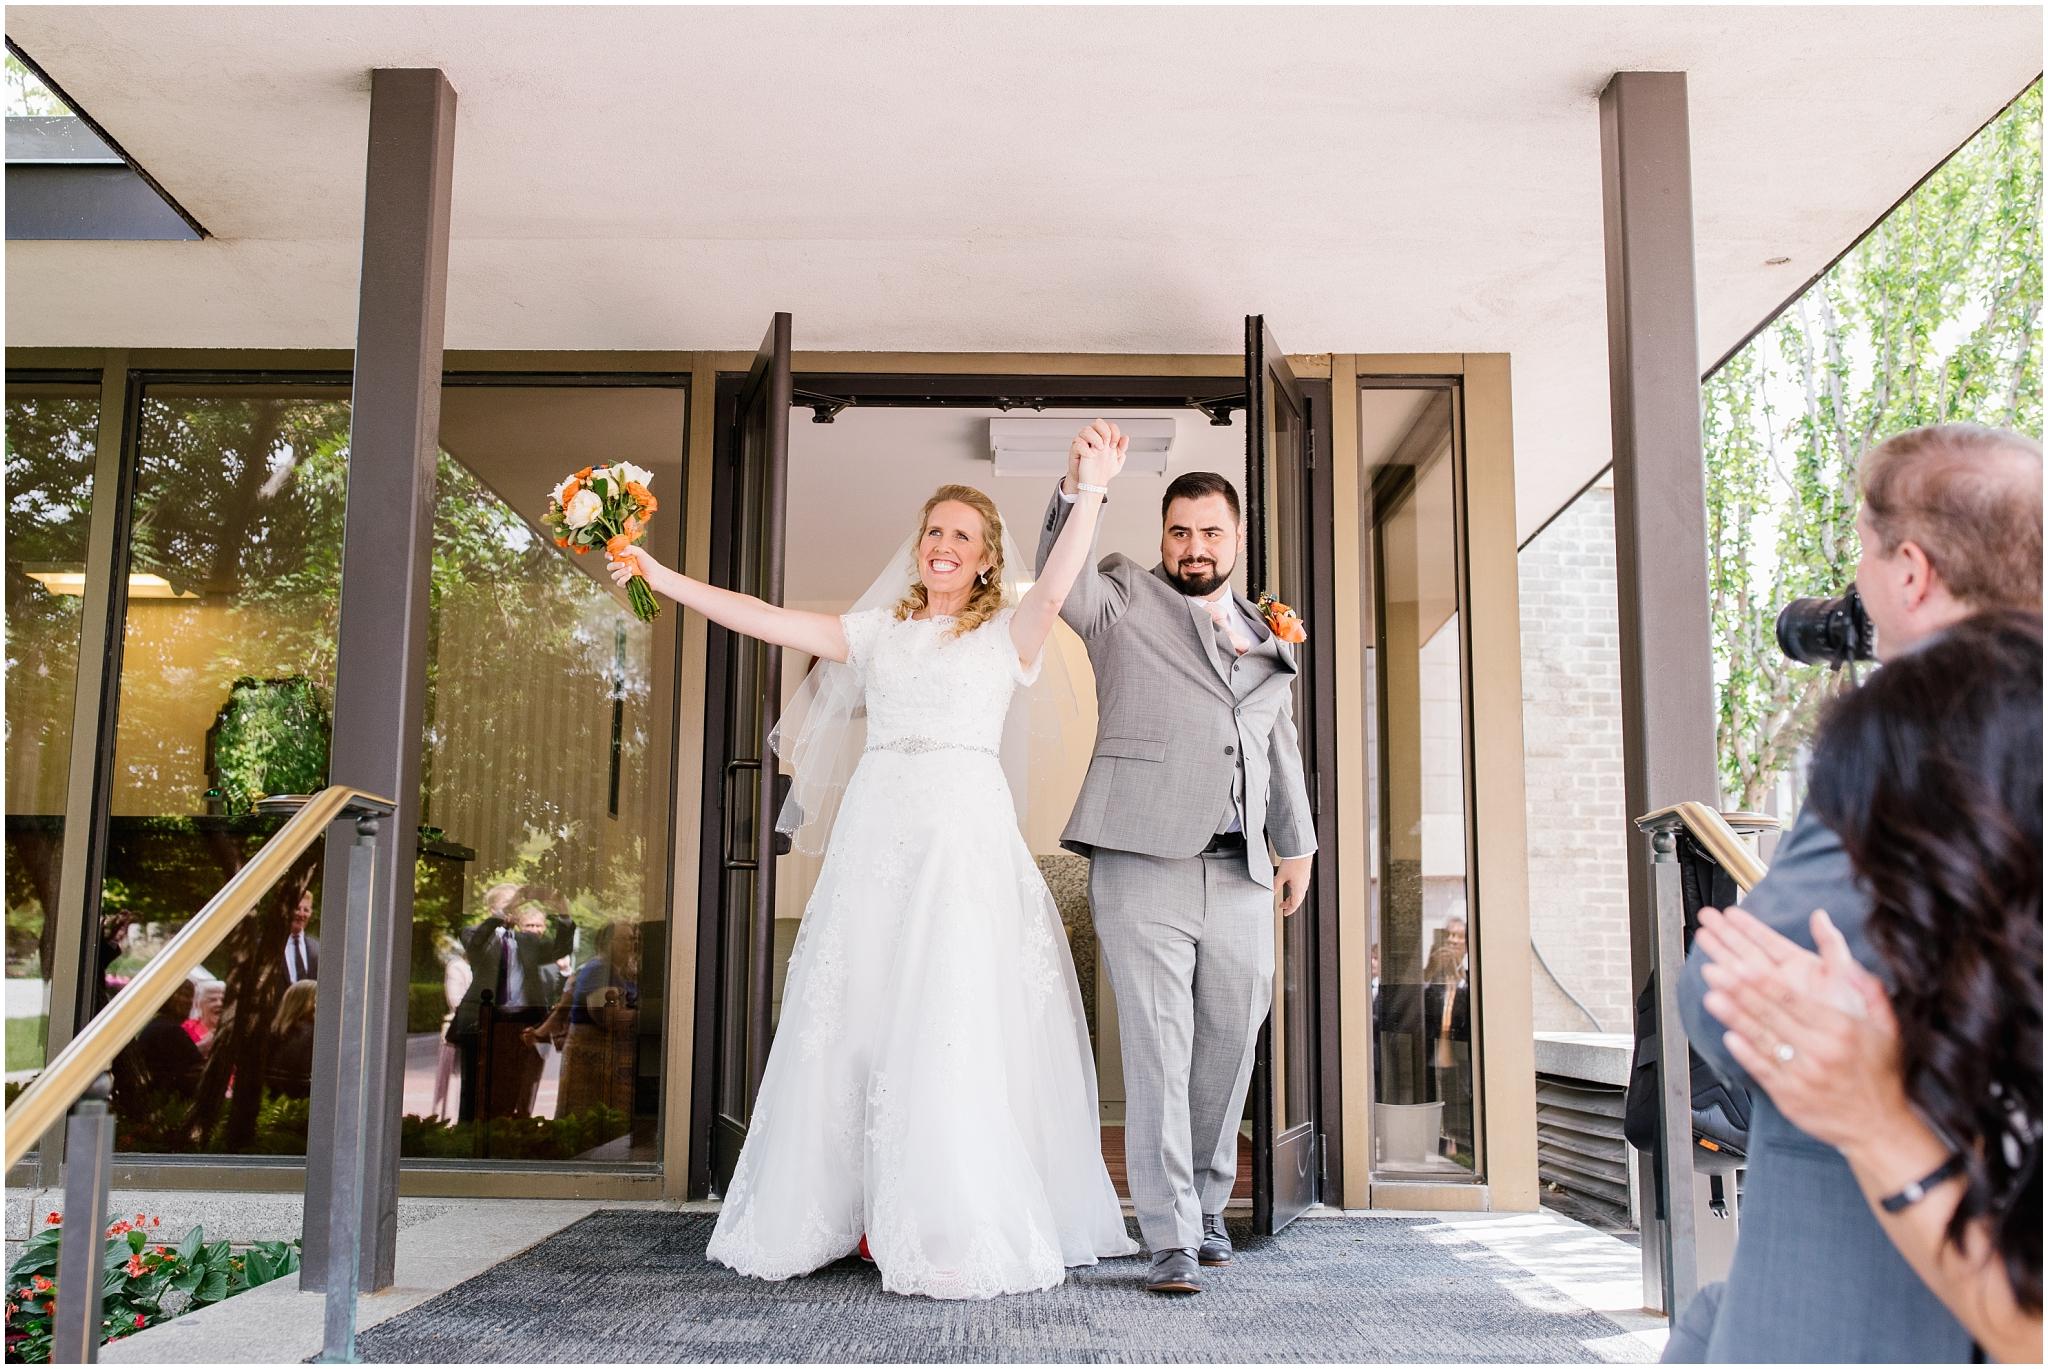 Justin and Melissa-2_Lizzie-B-Imagery-Utah-Wedding-Photographer-Salt-Lake-City-Temple-The-Grand-Ballroom.jpg